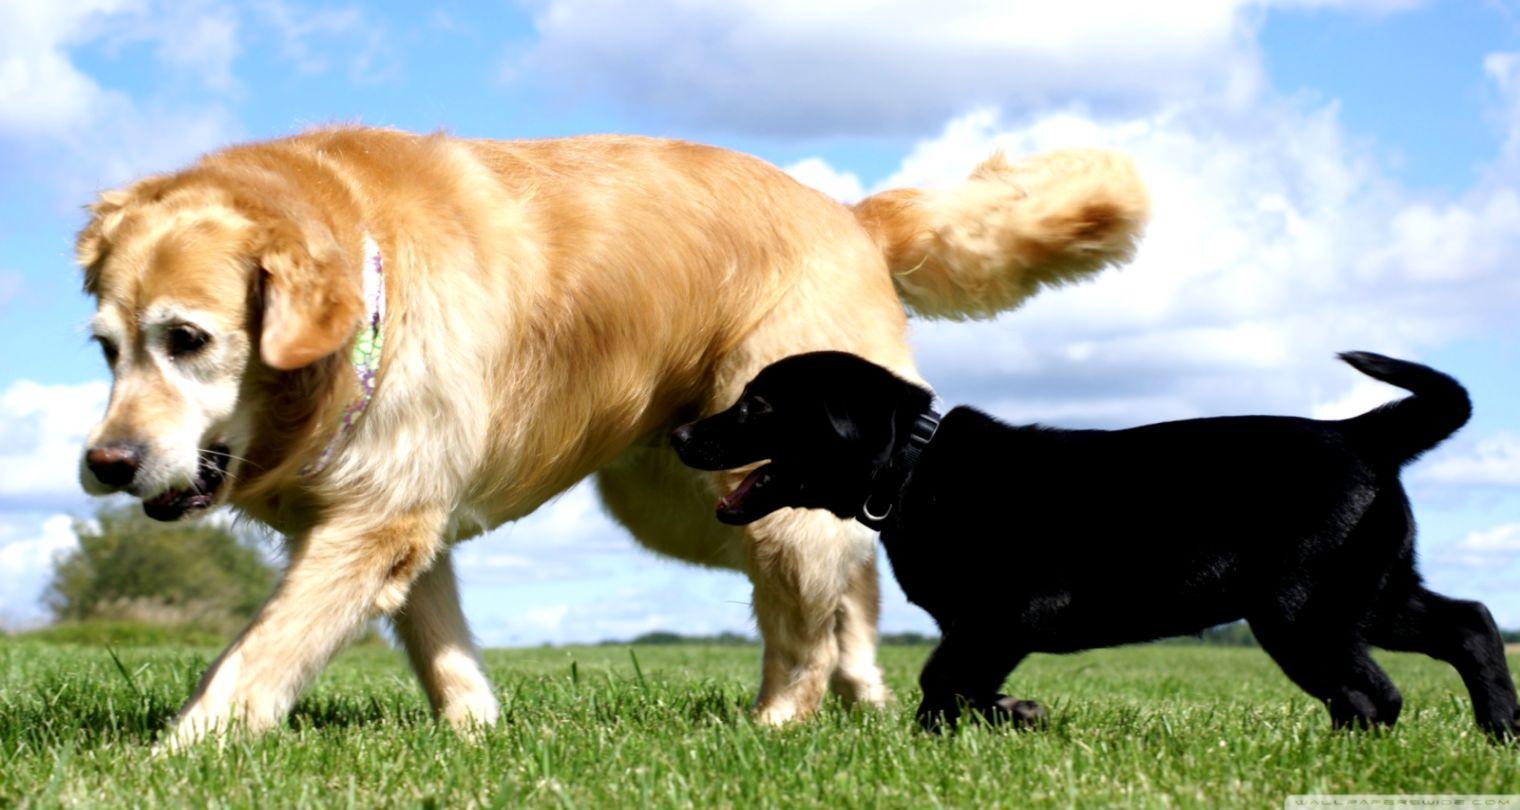 Dog Black Labrador Retriever Look Hd Wallpaper Smart Wallpapers